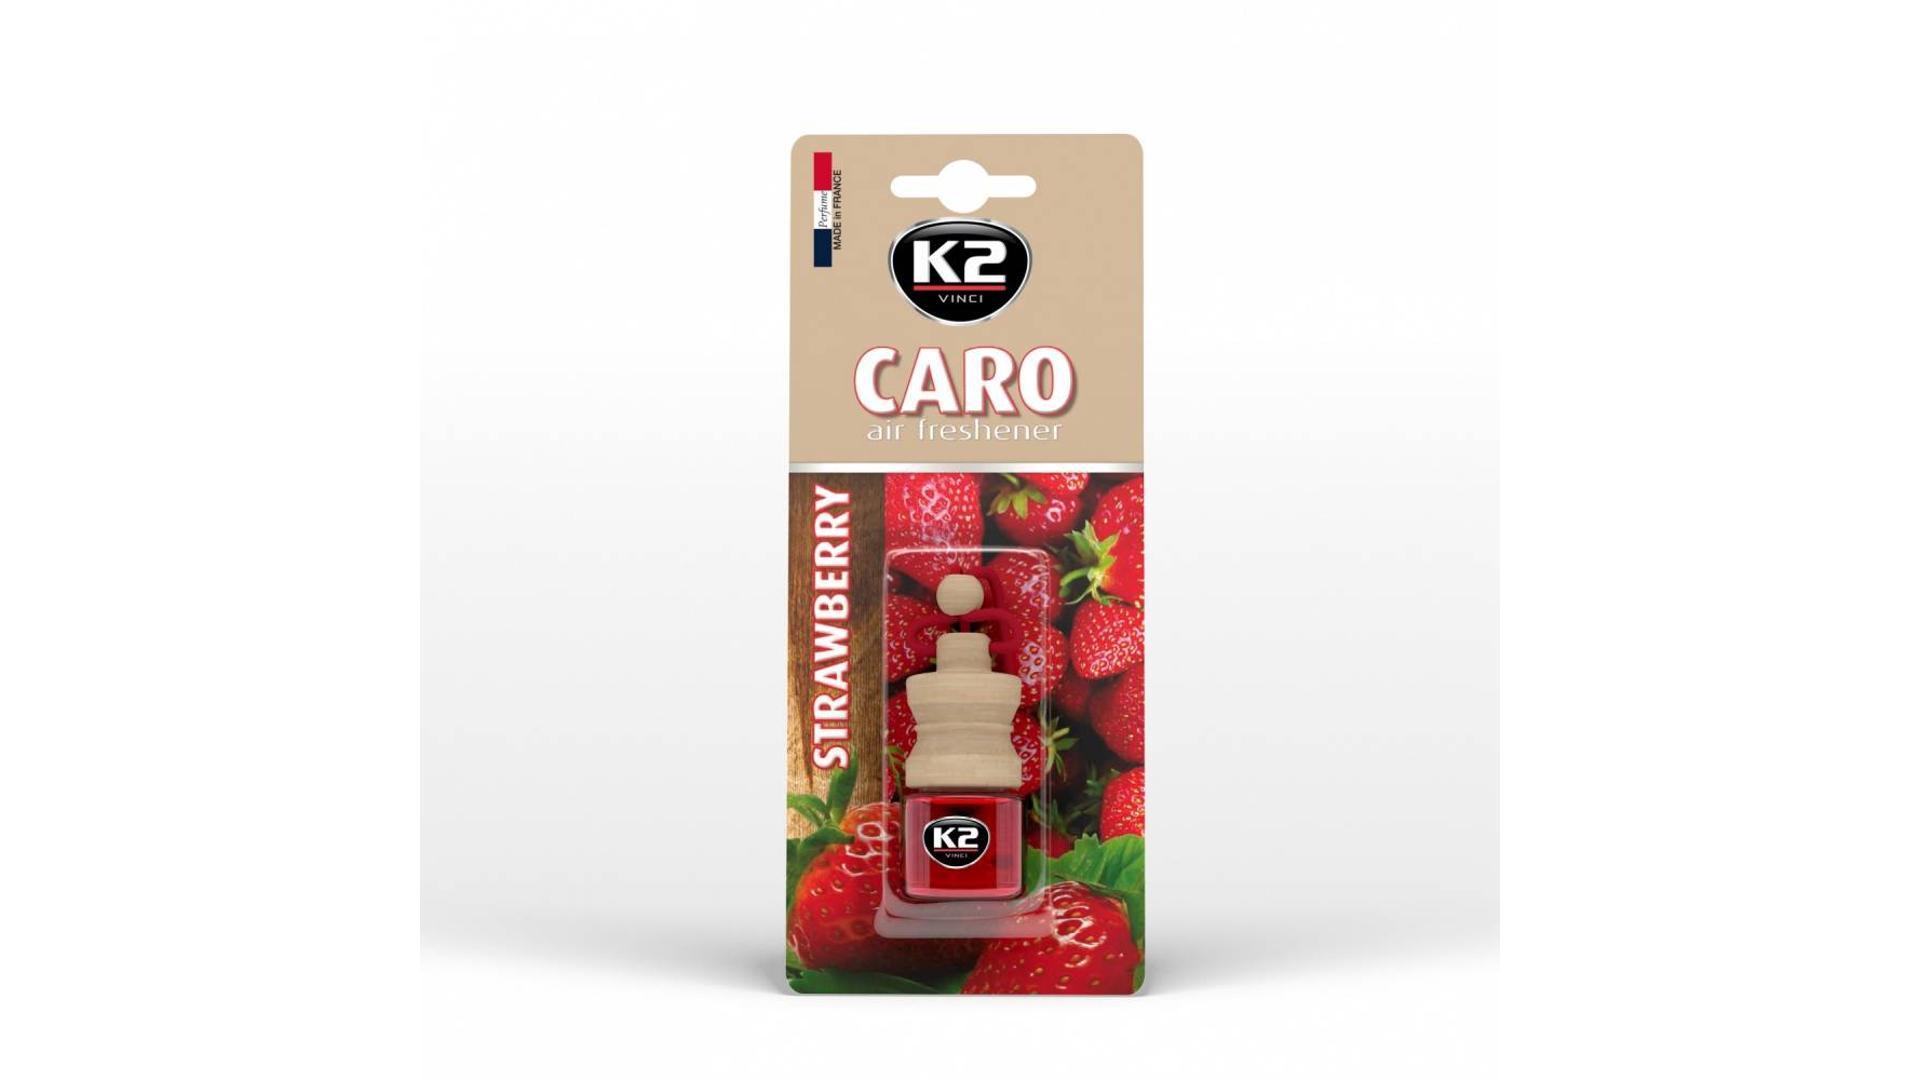 K2 CARO osvěžovač vzduchu - Jahoda 4ml